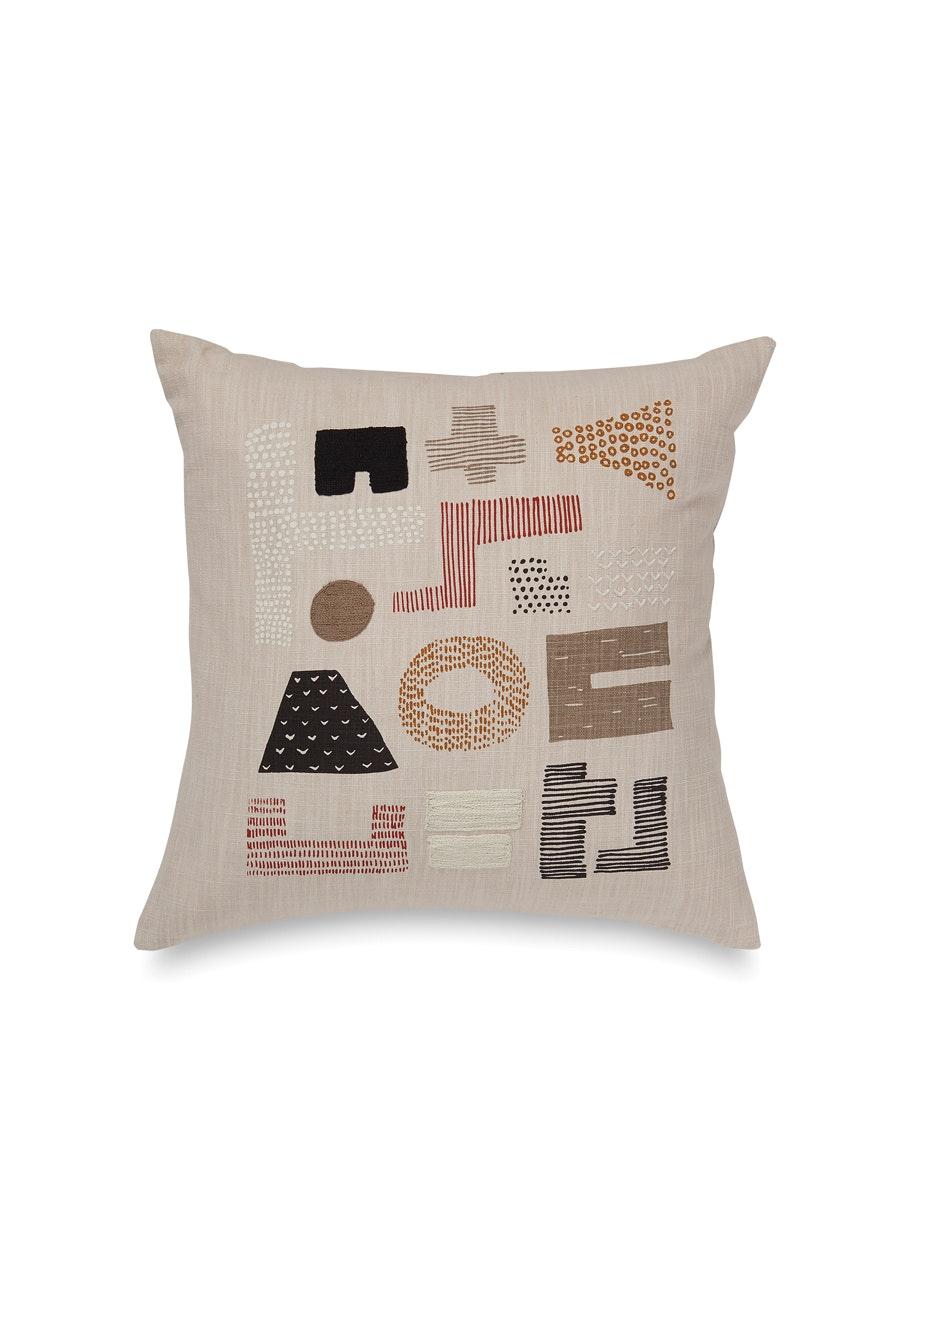 Città - Obi Embroidered Cushion Cover